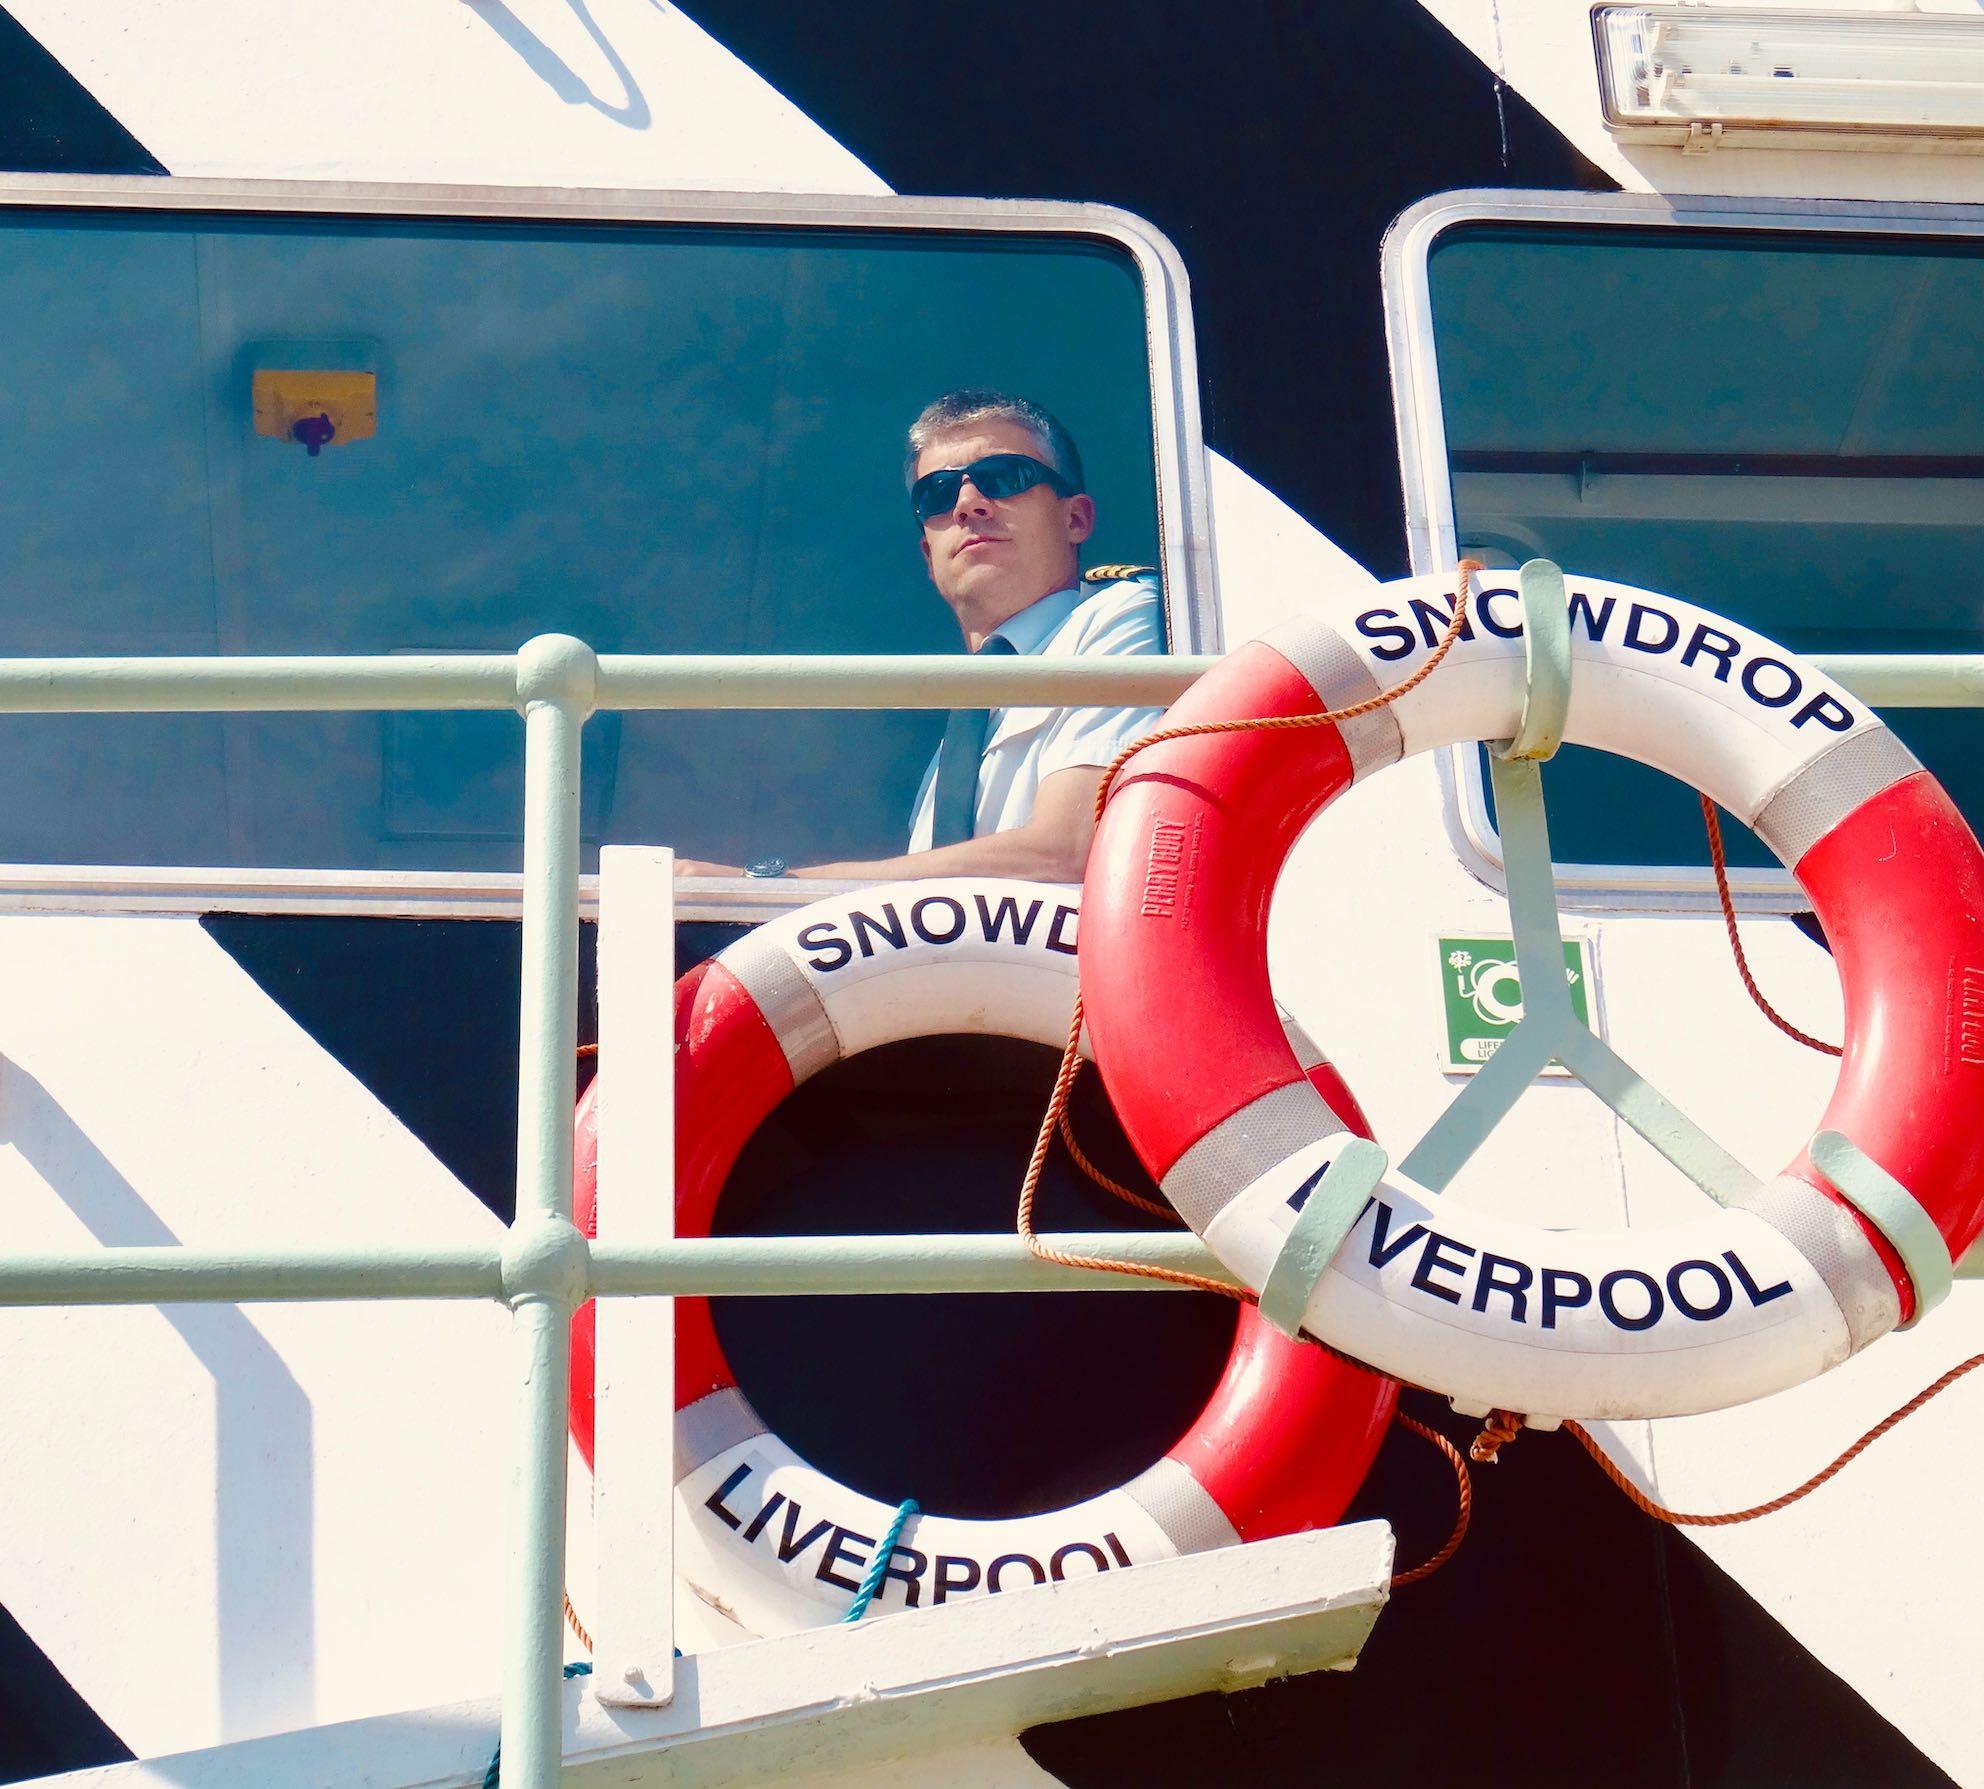 MV Snowdrop Liverpool.